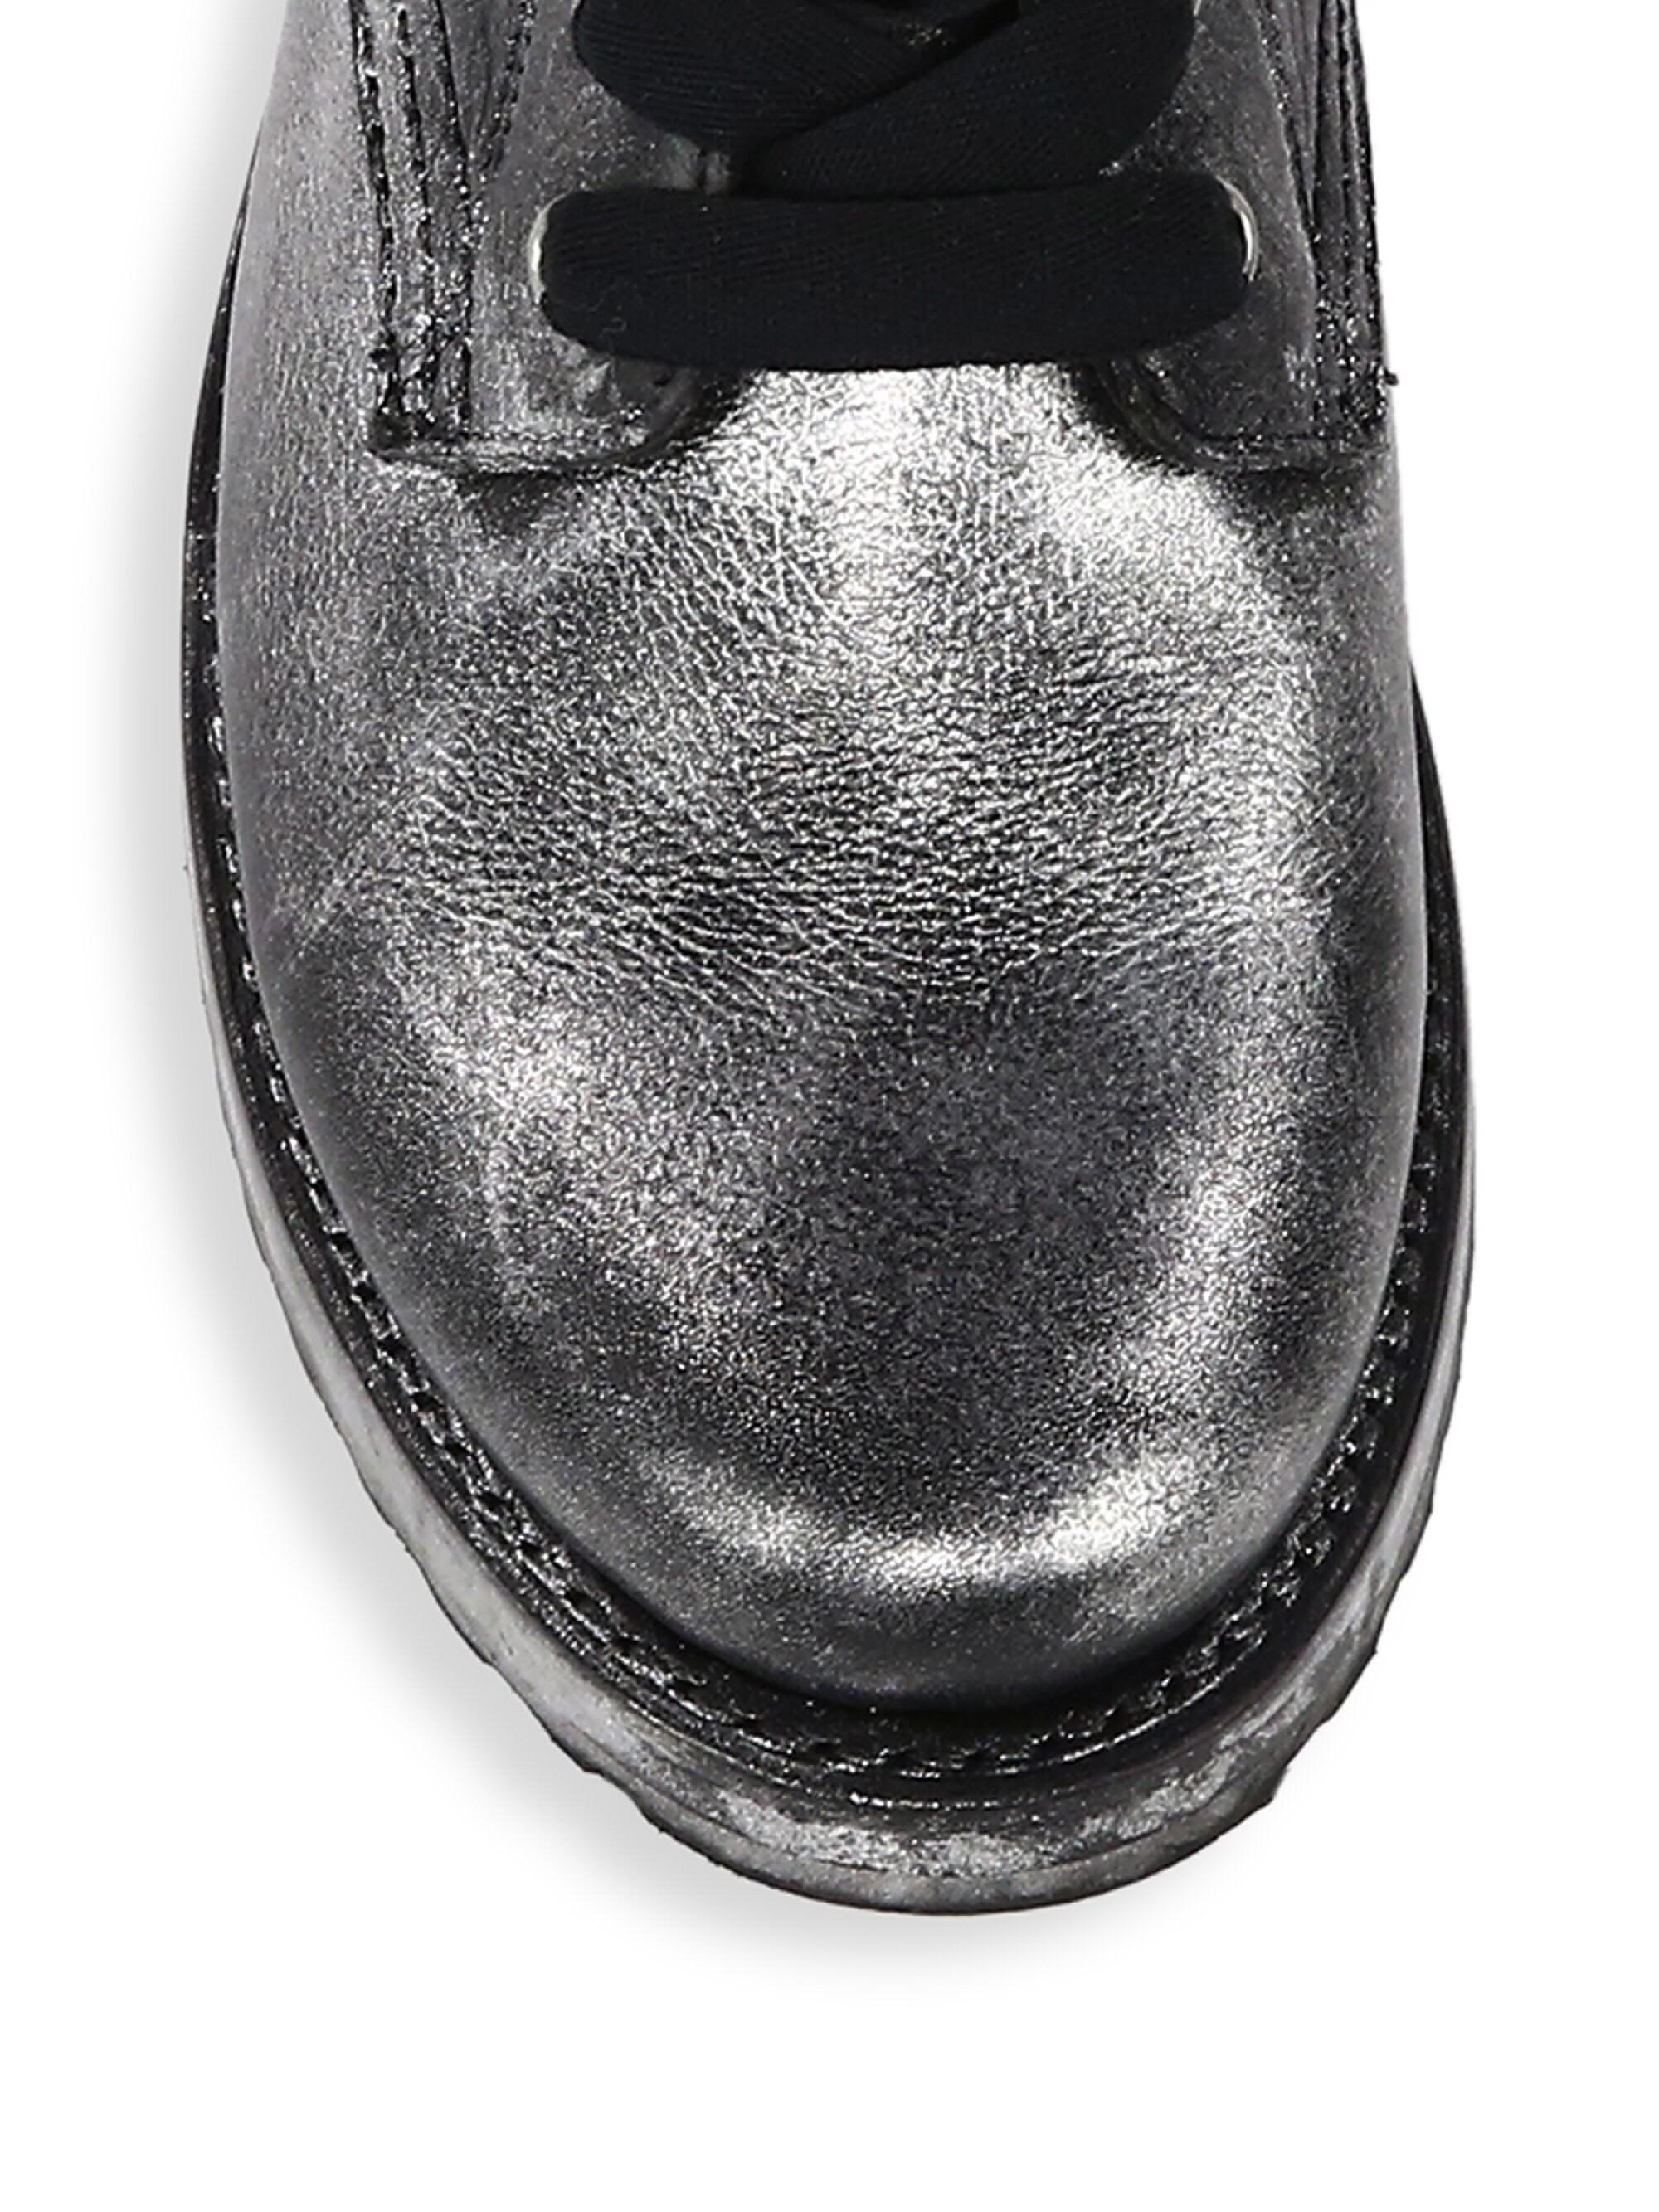 e3670a4f6 Lyst - Frye Women's Veronica Leather Combat Boots - Black Multi in Black